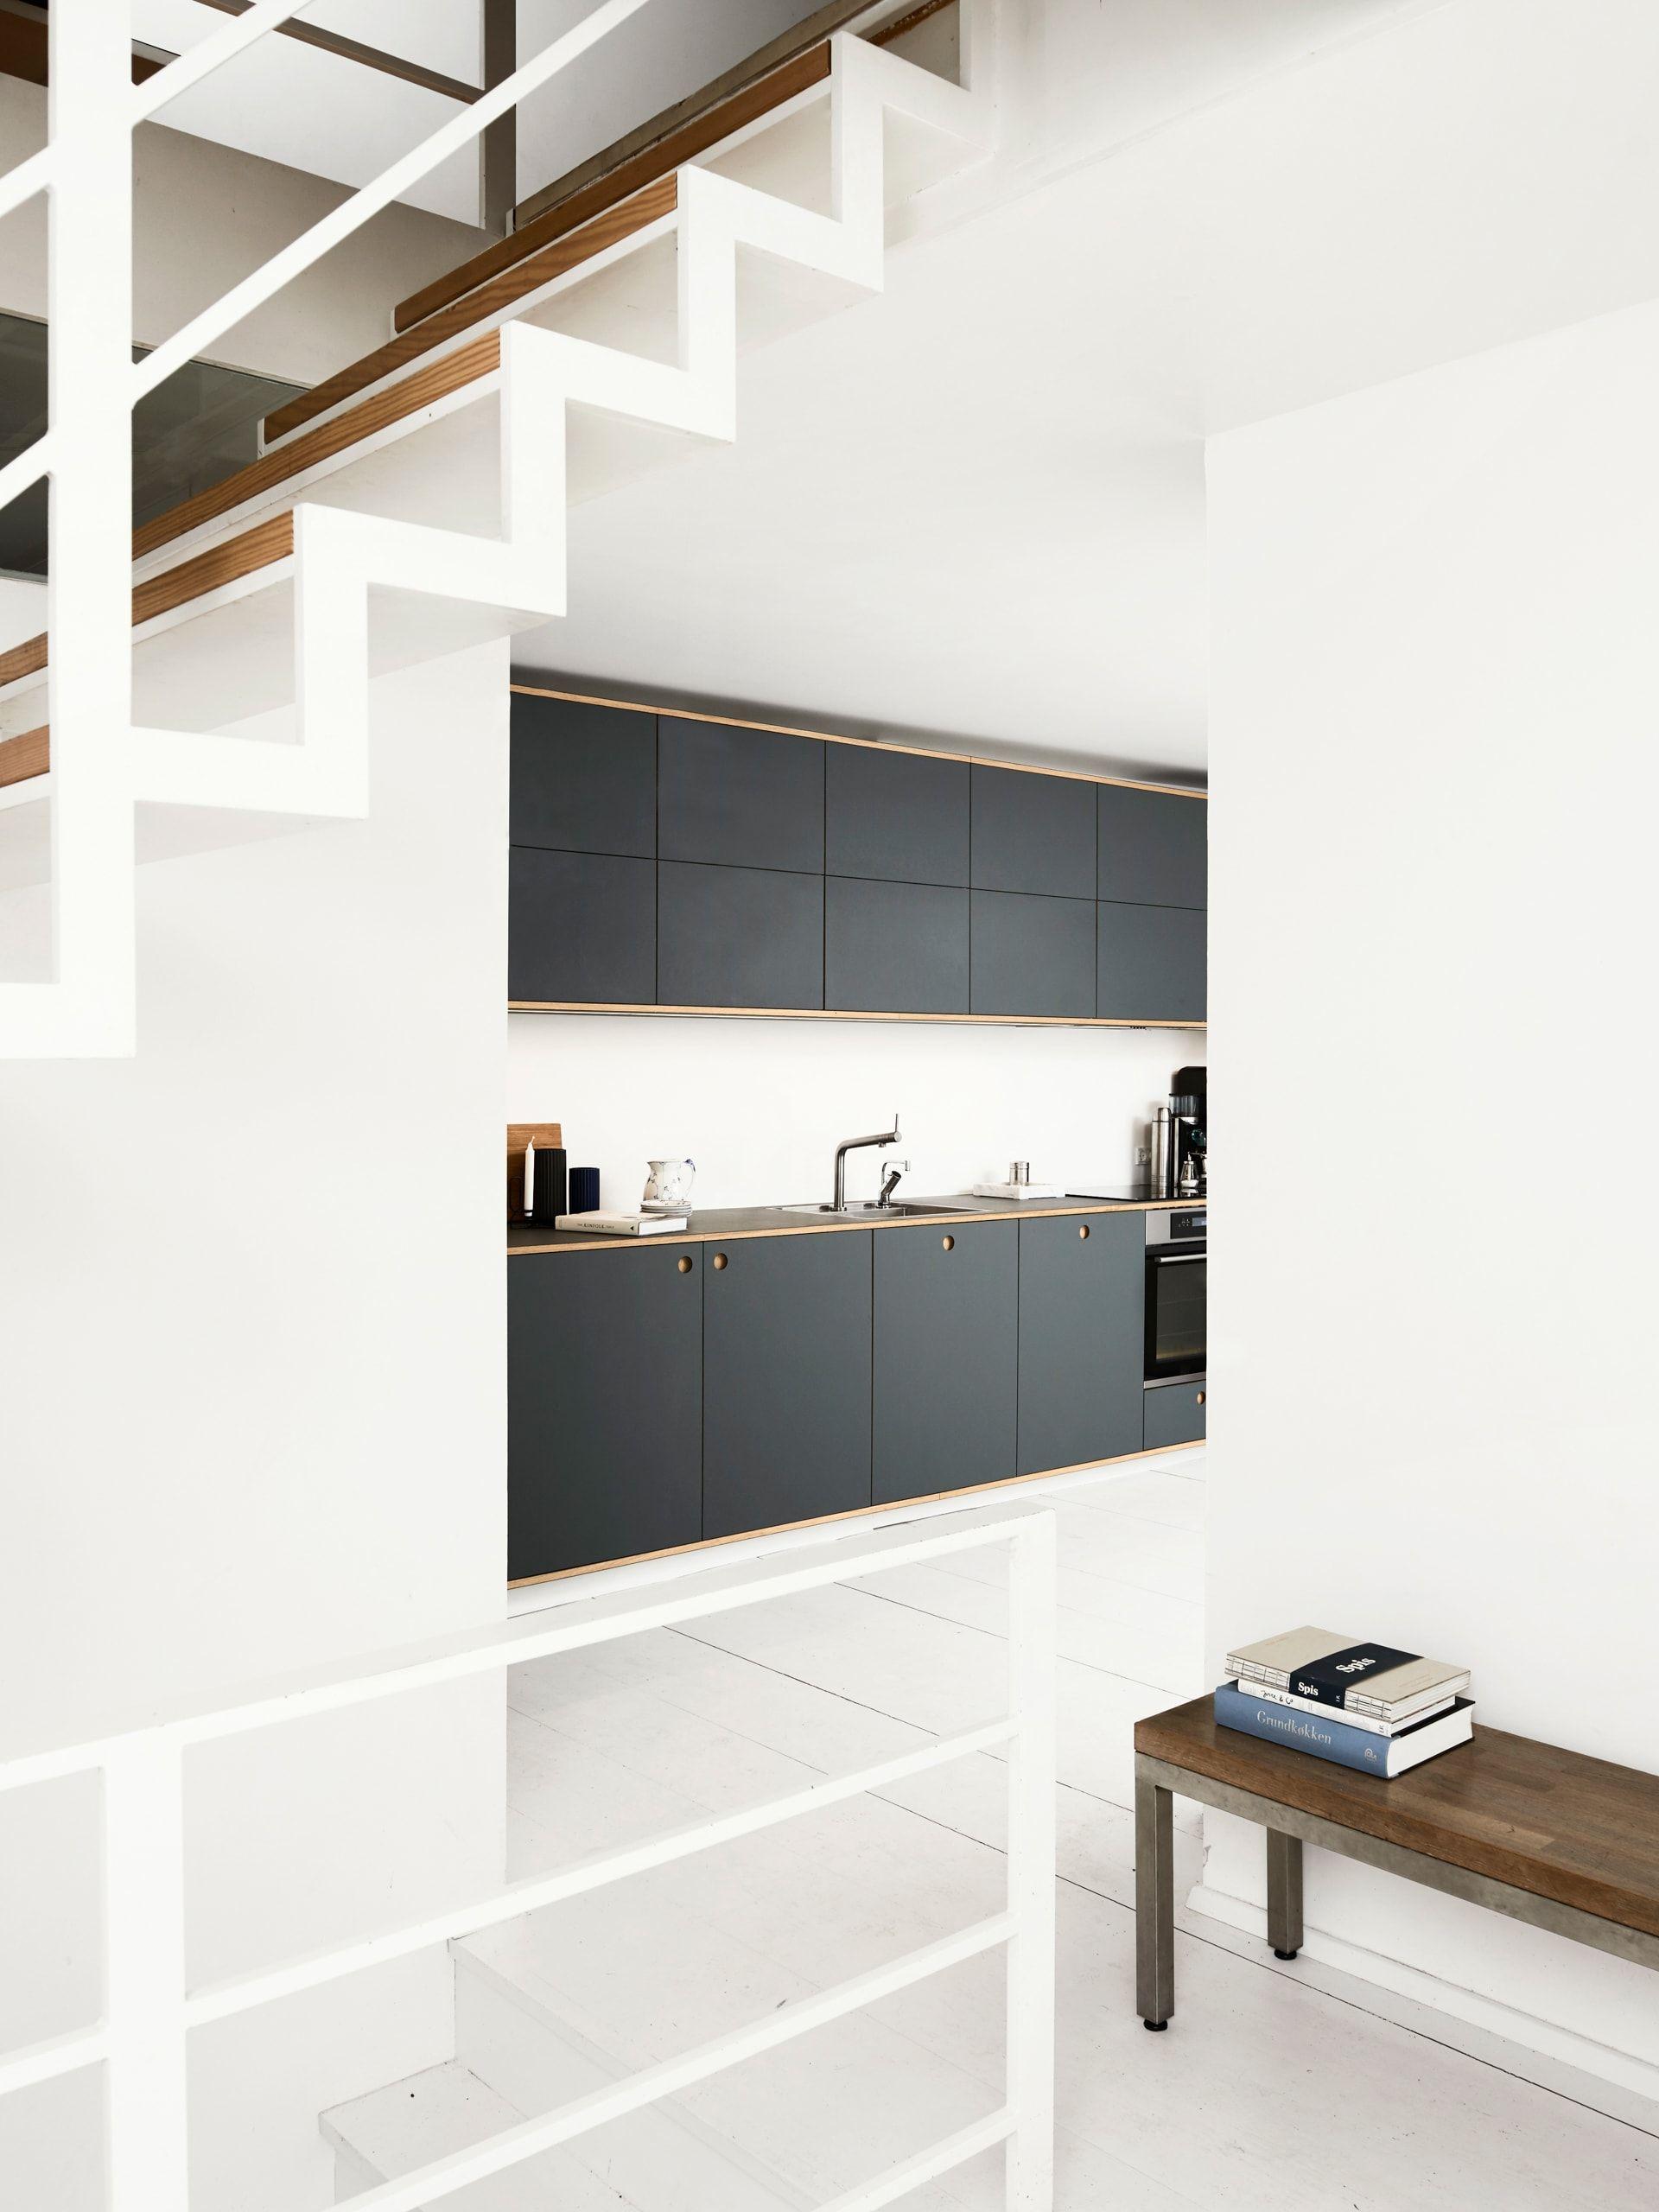 Vesterf lledvej in vesterbro denmark kitchens for Linoleum ikea